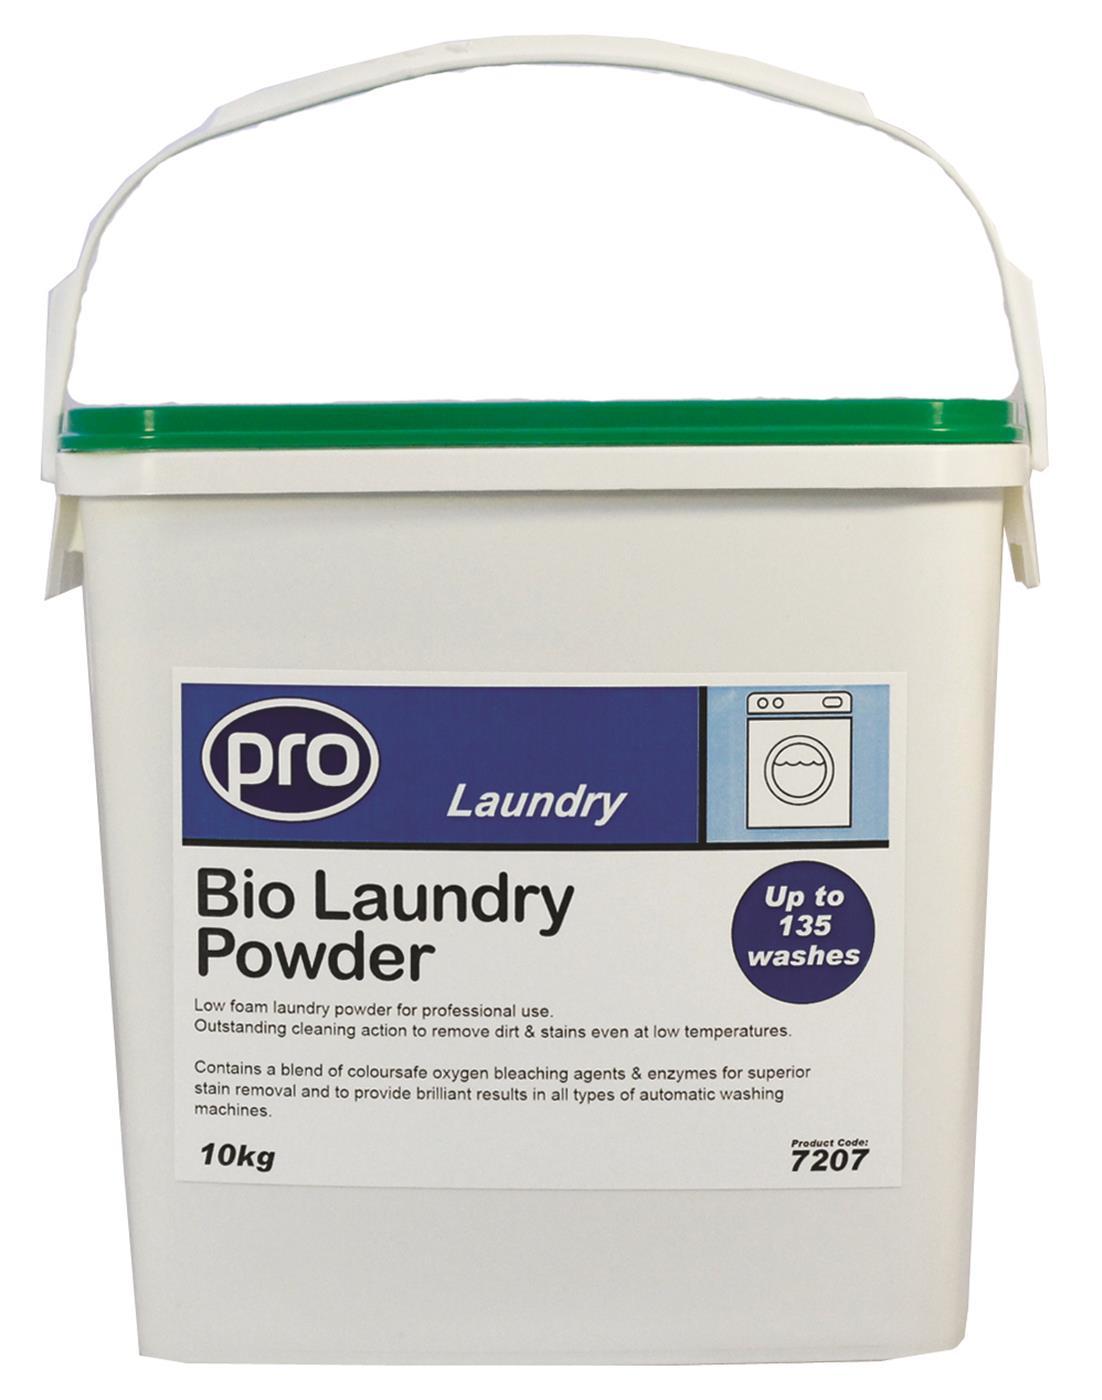 PRO Bio Laundry Powder 10kg